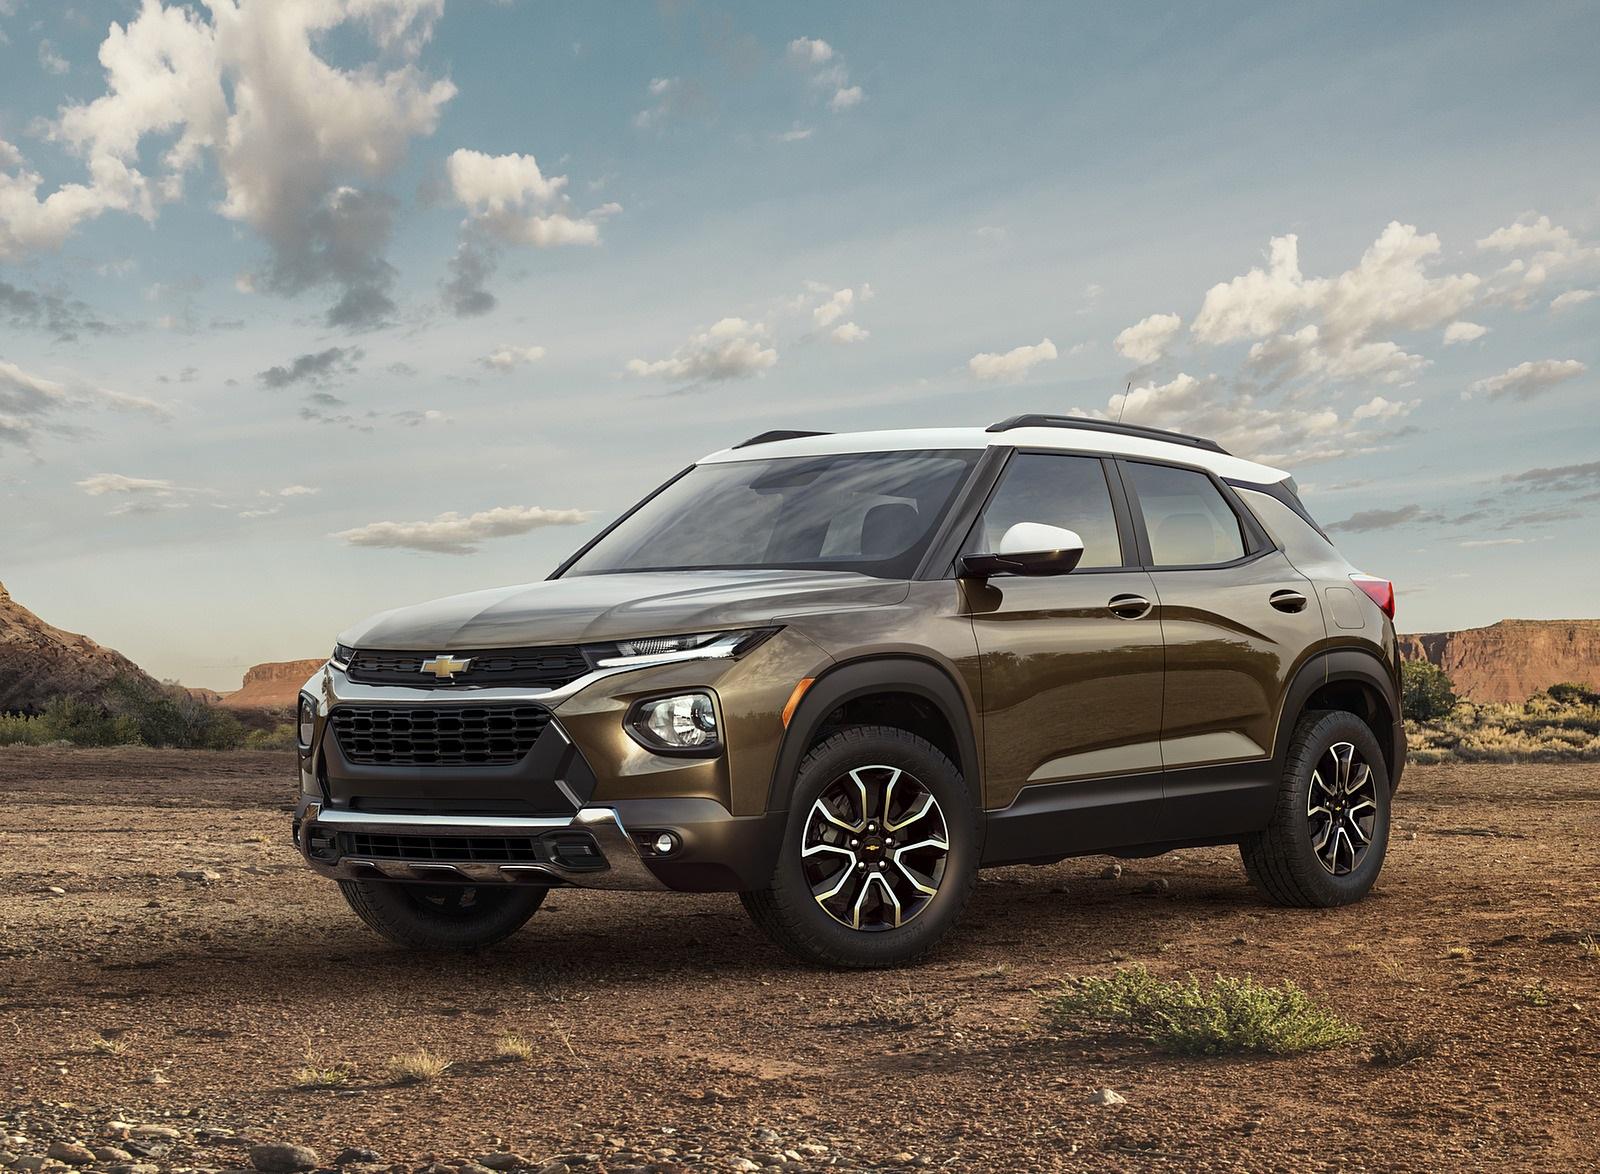 2021 Chevrolet Trailblazer ACTIV Front Three-Quarter Wallpapers (7)